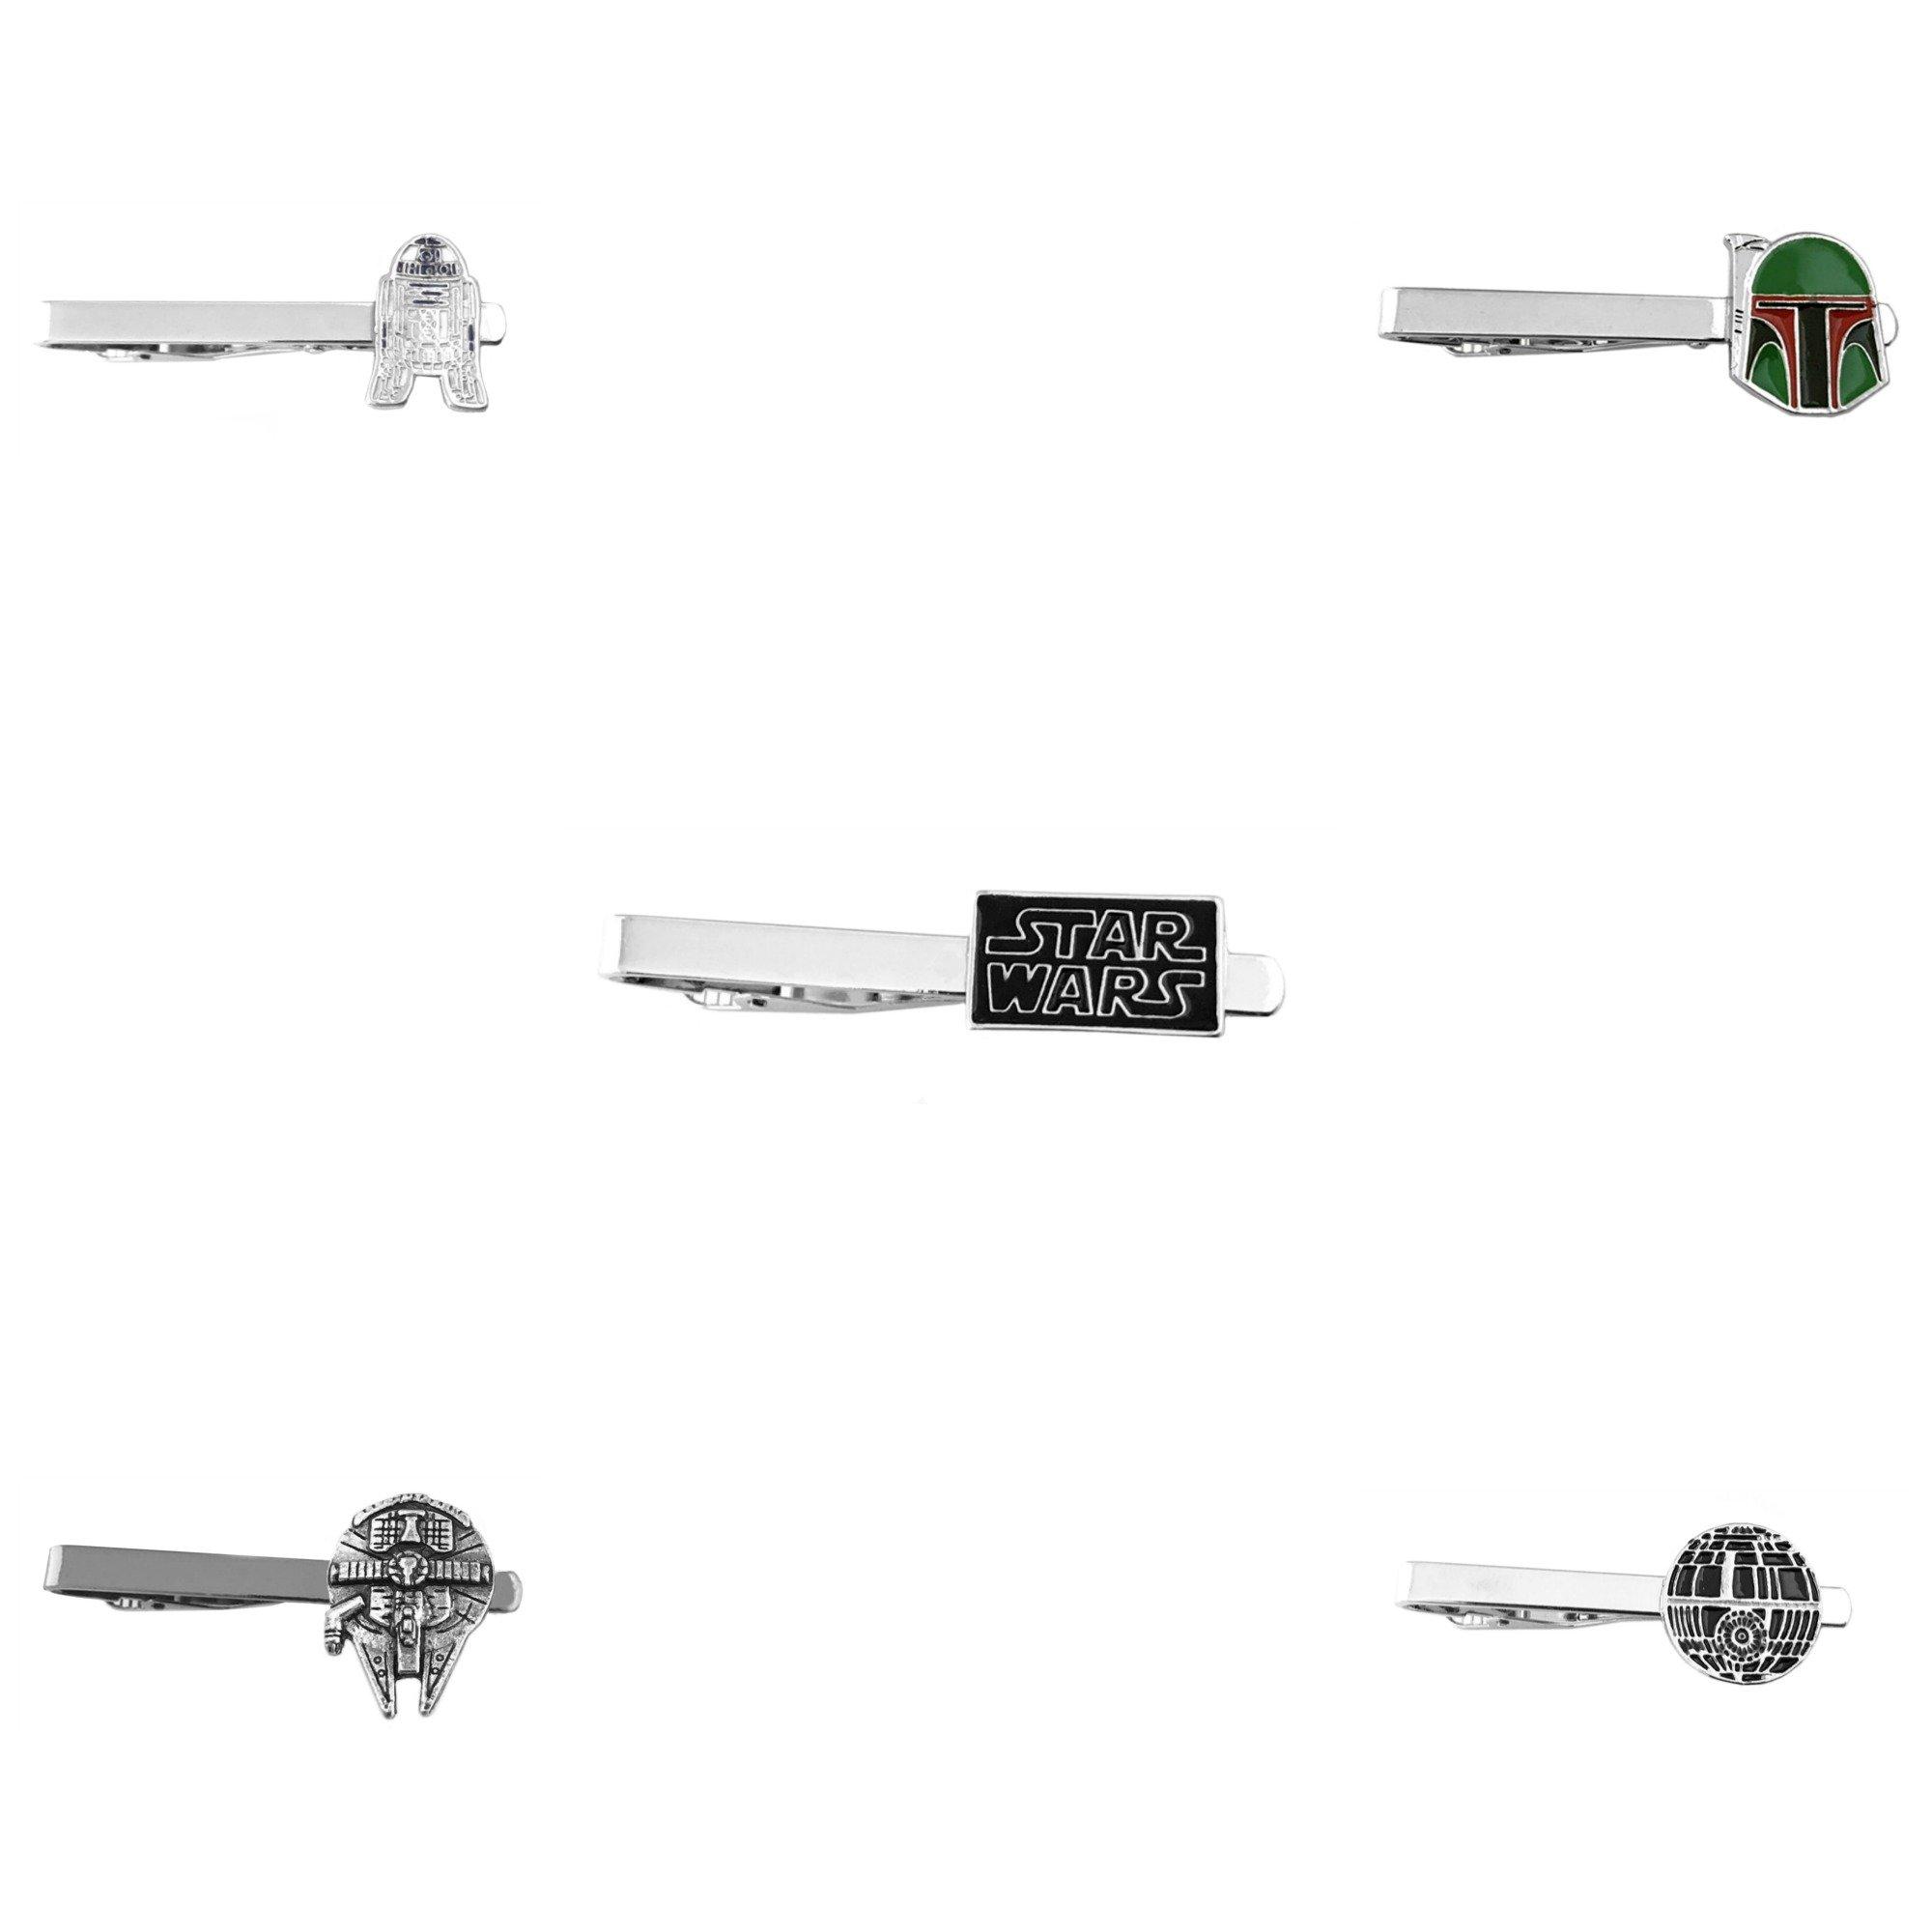 Outlander Star Wars - Assorted Assortment - Tiebar Tie Clasp Set of 5 Wedding Superhero Logo w/Gift Box by Outlander (Image #2)